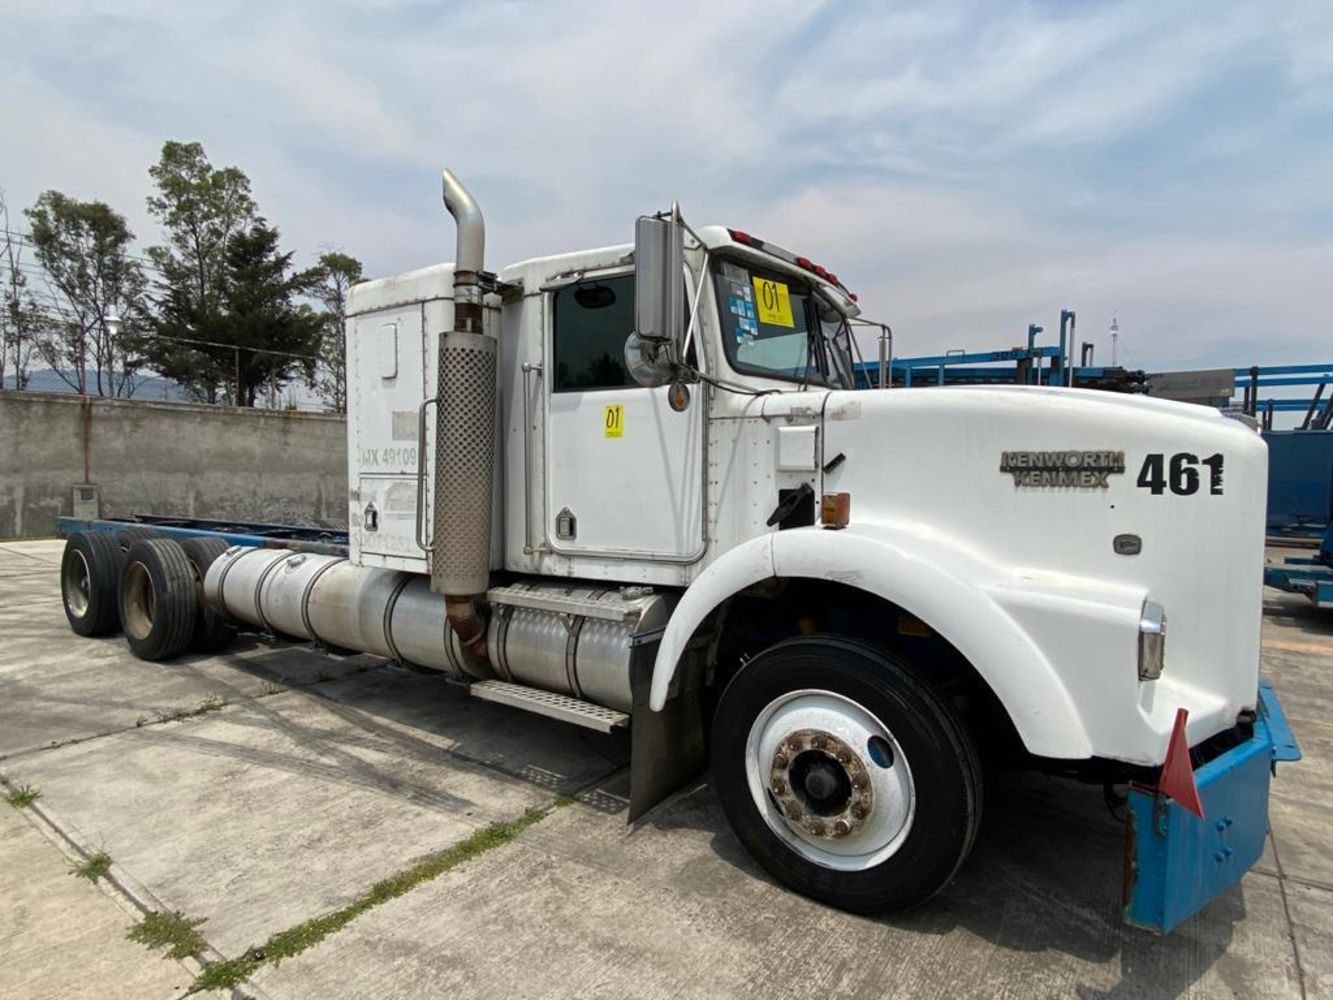 Dump Trucks, Reach Stacker, Semi-Trucks, Moto Graders, Crane Truck and more Heavy Duty Caterpillar Equipment